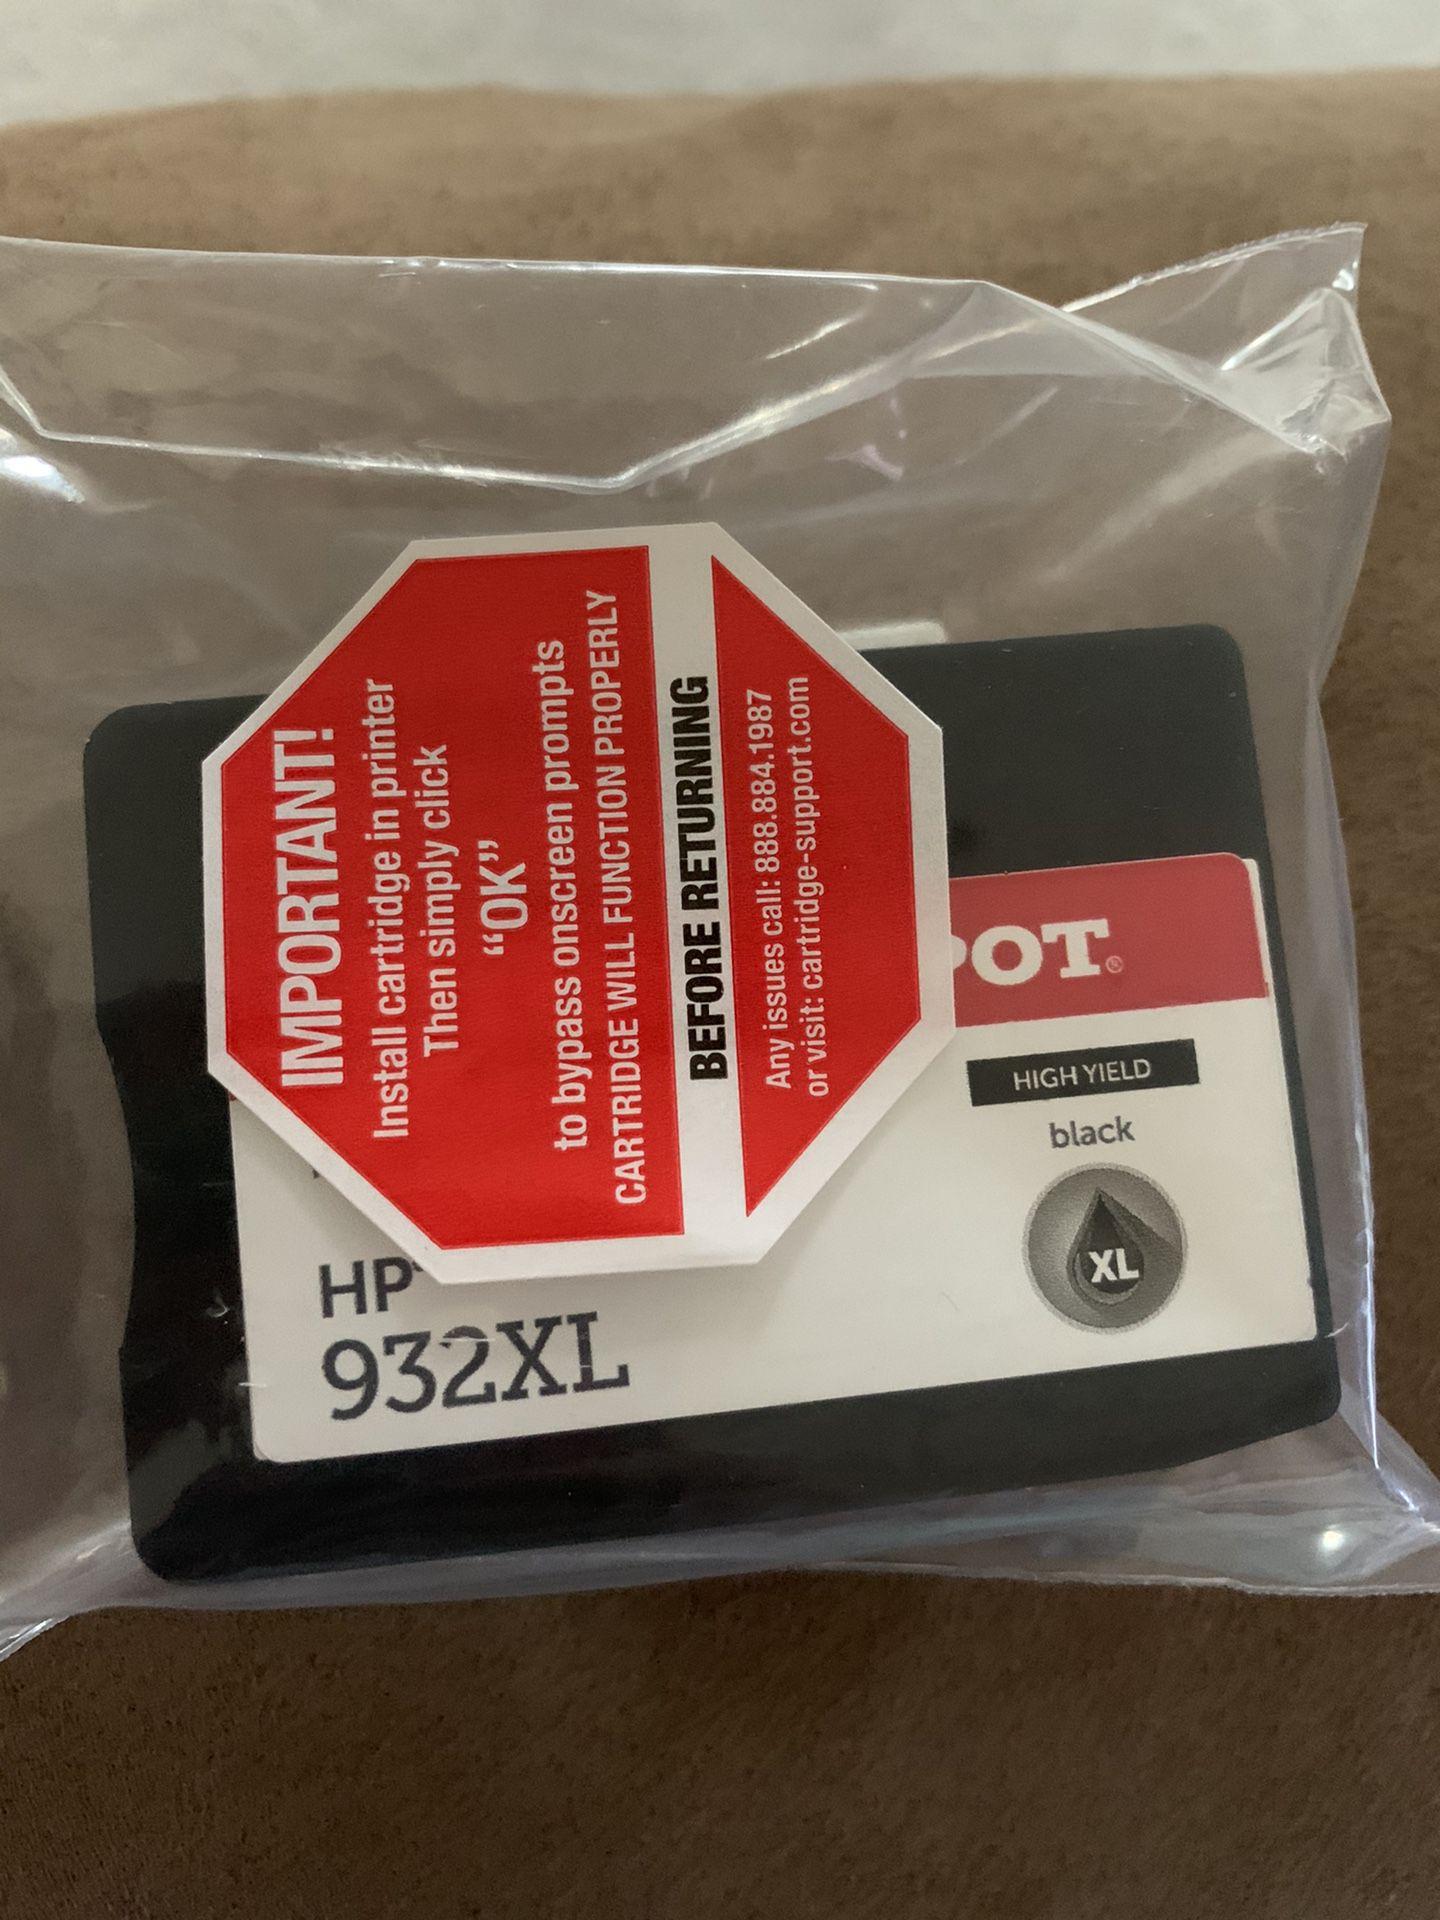 HP 932xl In Cartridges